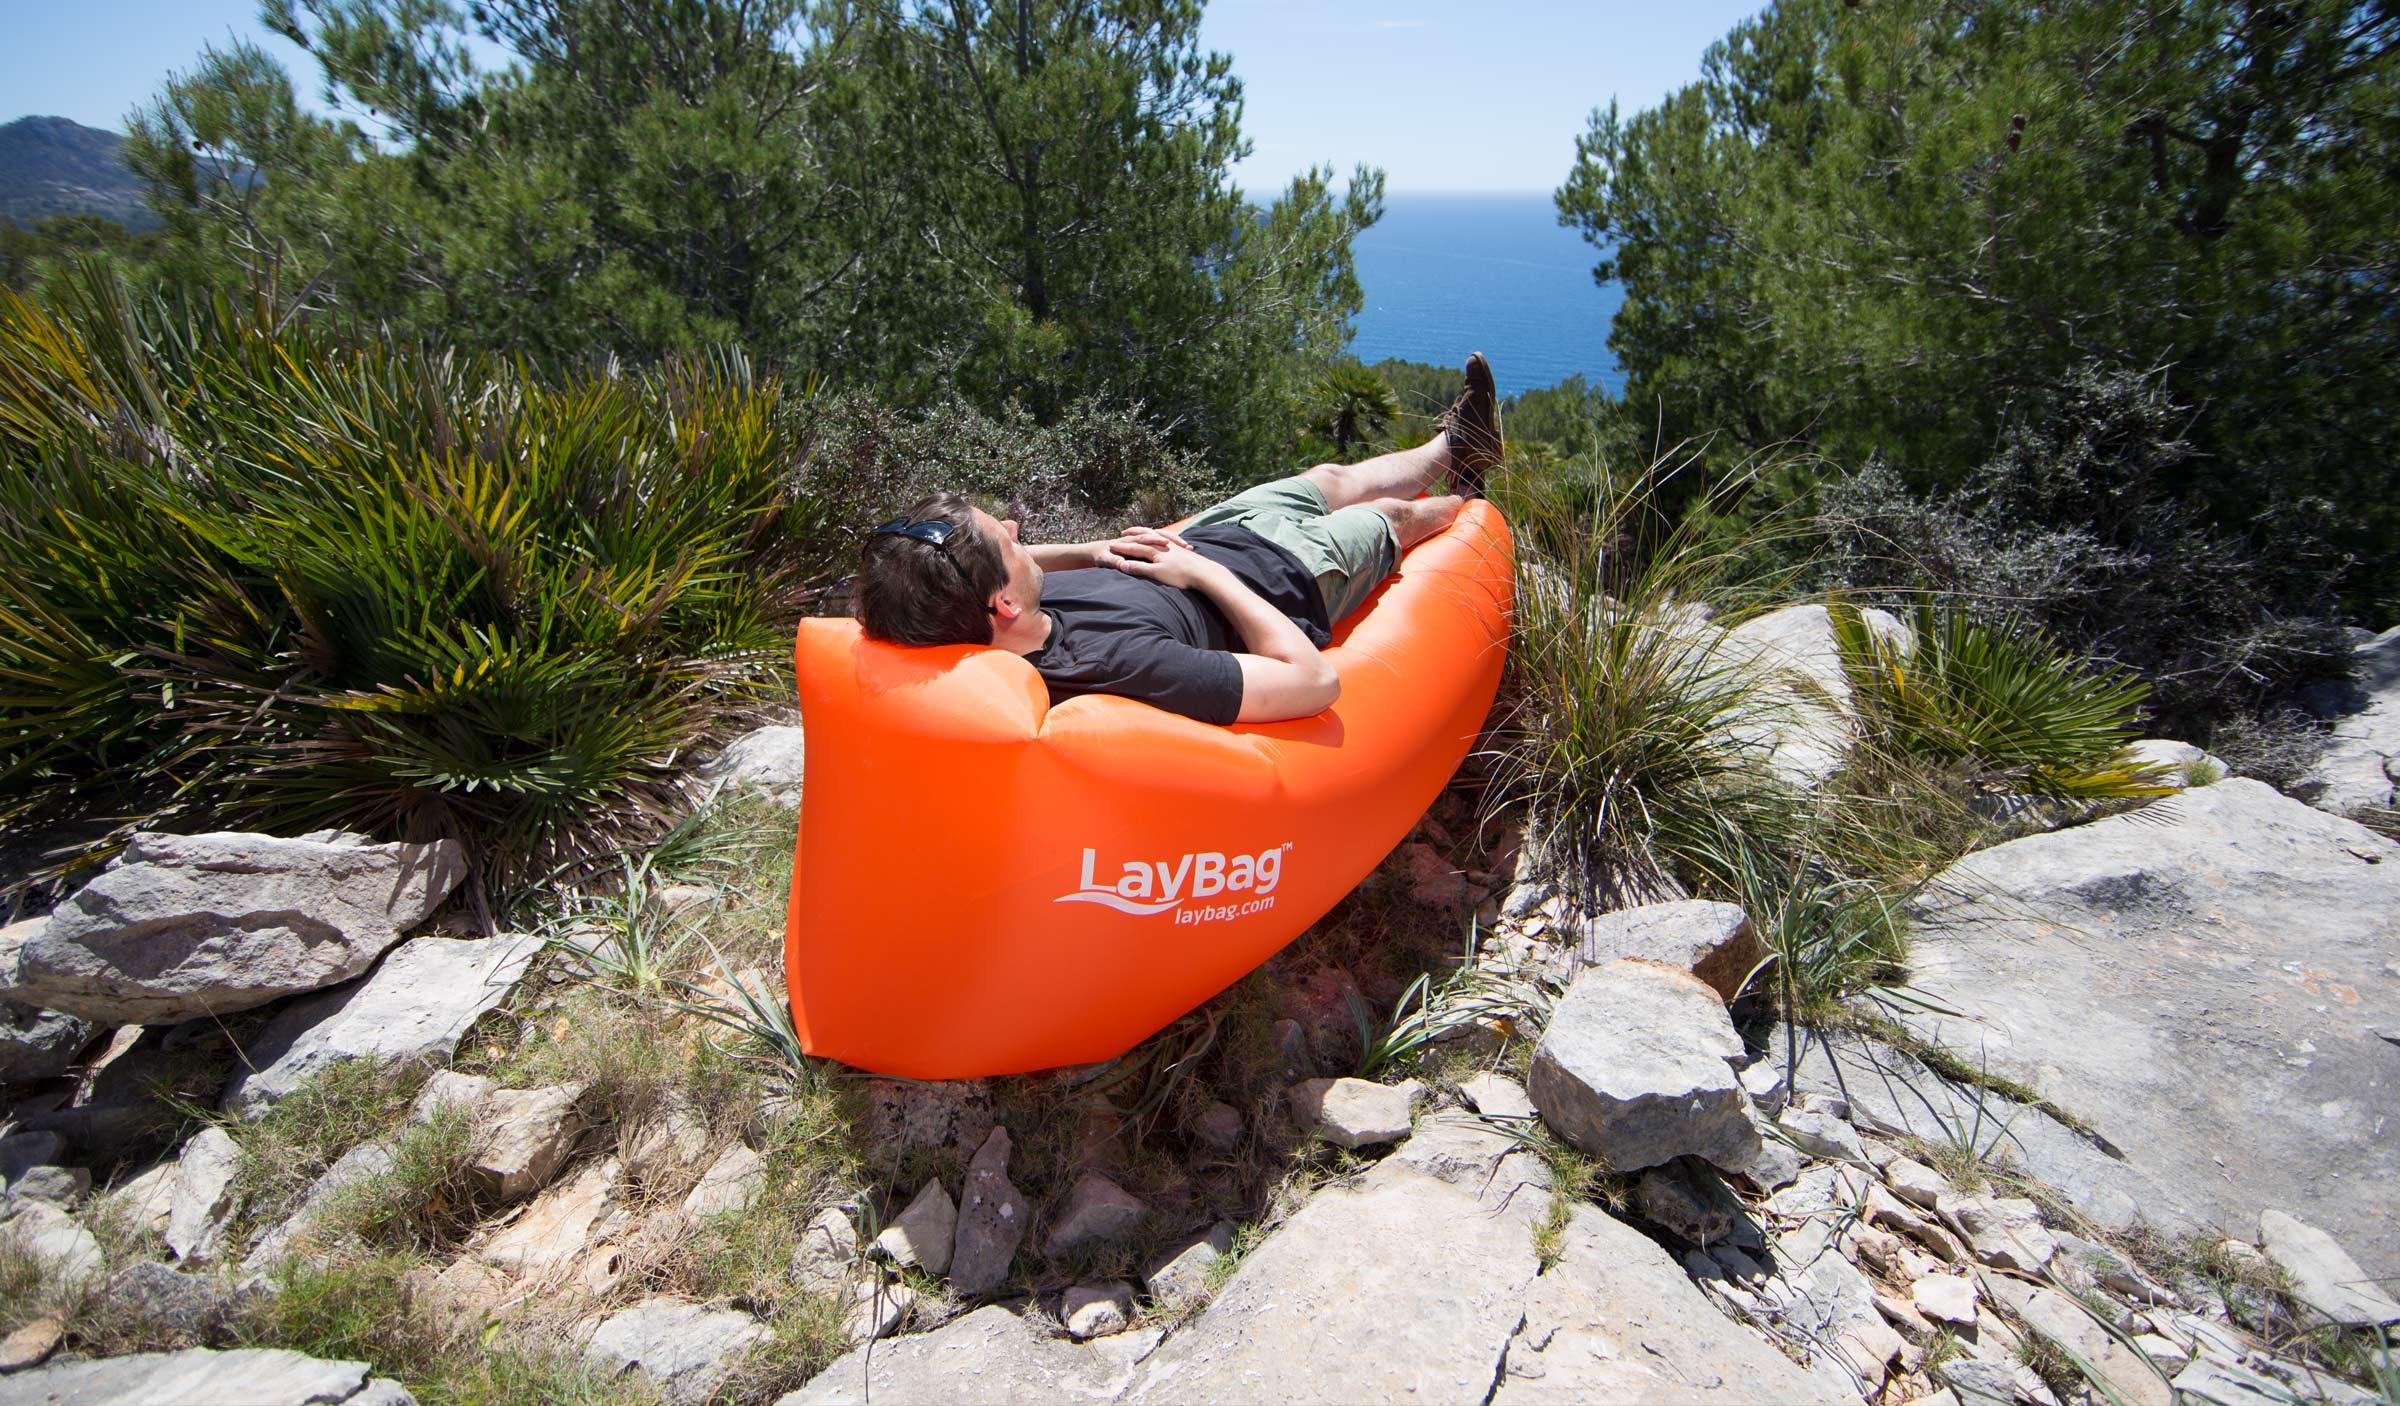 Lay Bag™ | BLACK Inflatable Air Sofa Lounge – LayBag